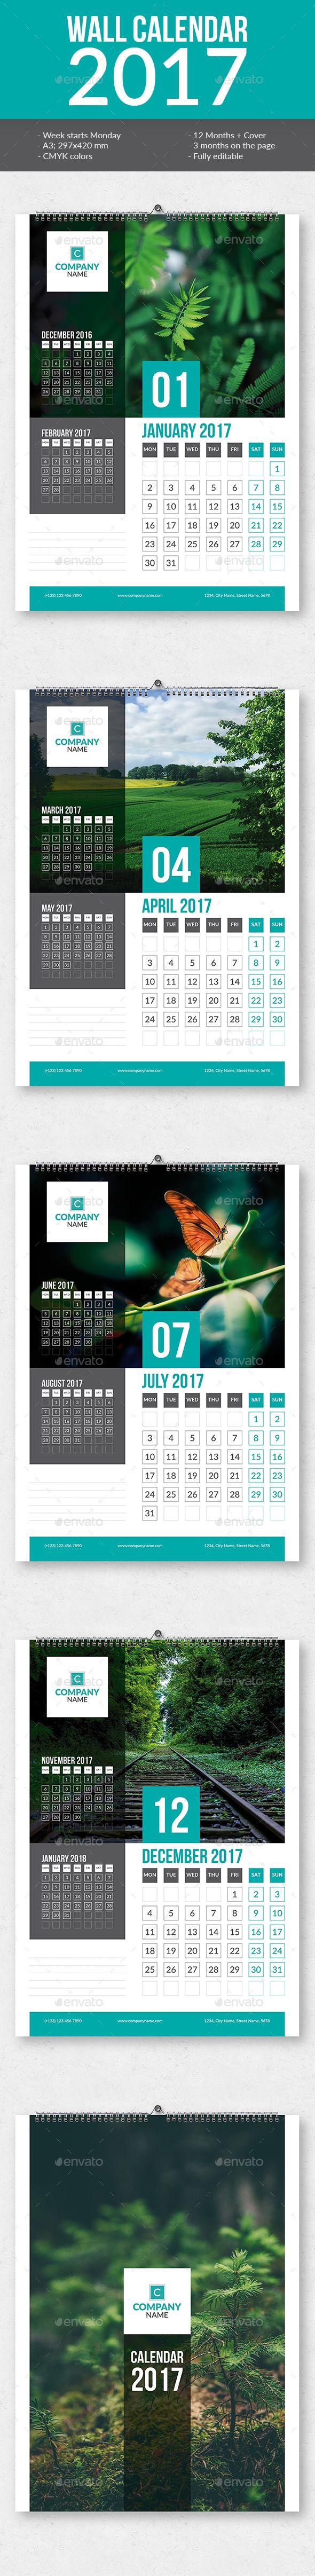 11 best corporate calendar design images on pinterest calendar design schedule design and. Black Bedroom Furniture Sets. Home Design Ideas